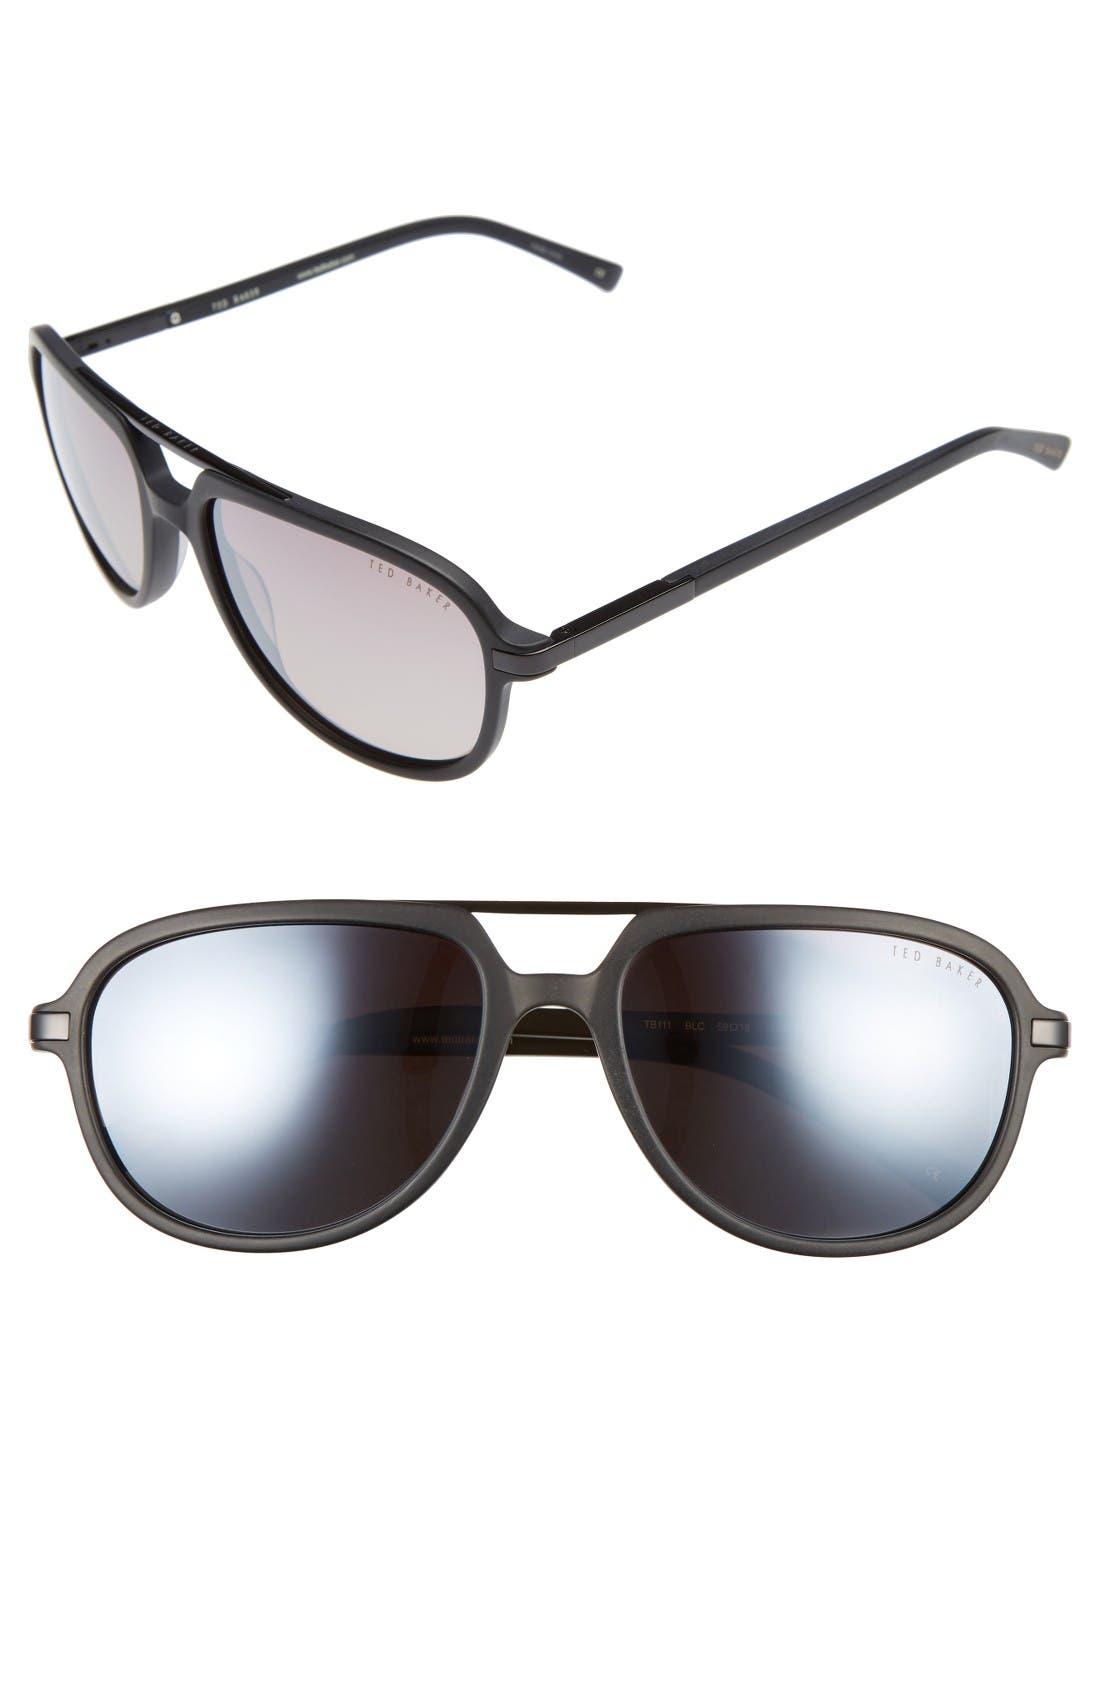 Ted Baker London 59mm Polarized Aviator Sunglasses